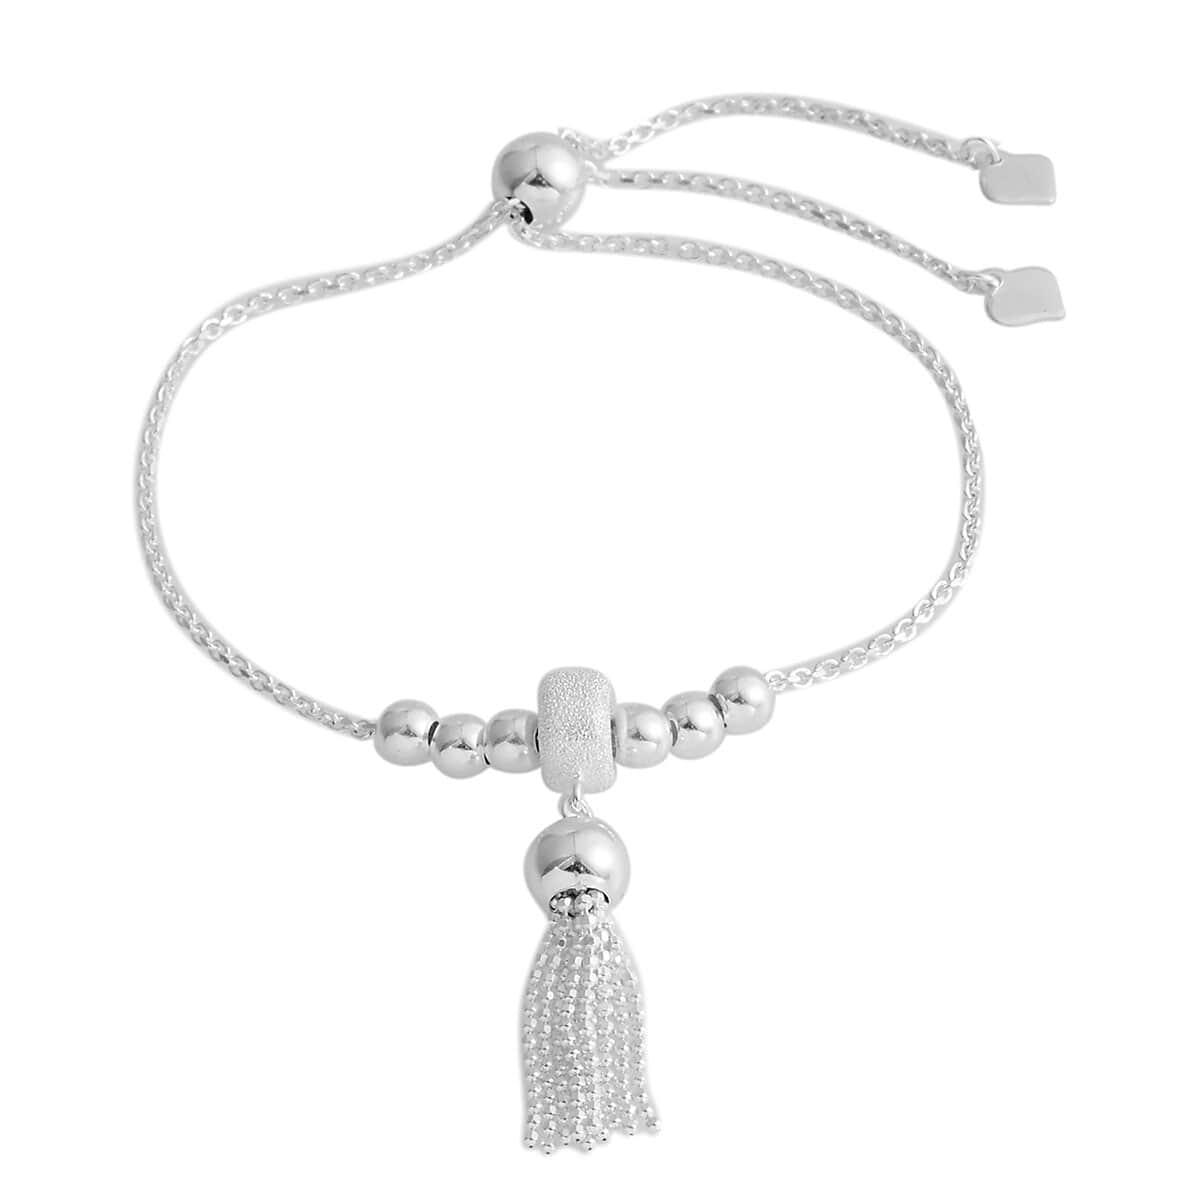 Dana Carrie Womens Stud Earrings 925 Sterling Silver Diamond Jewelry Accessories,8.48.4mm,Silver